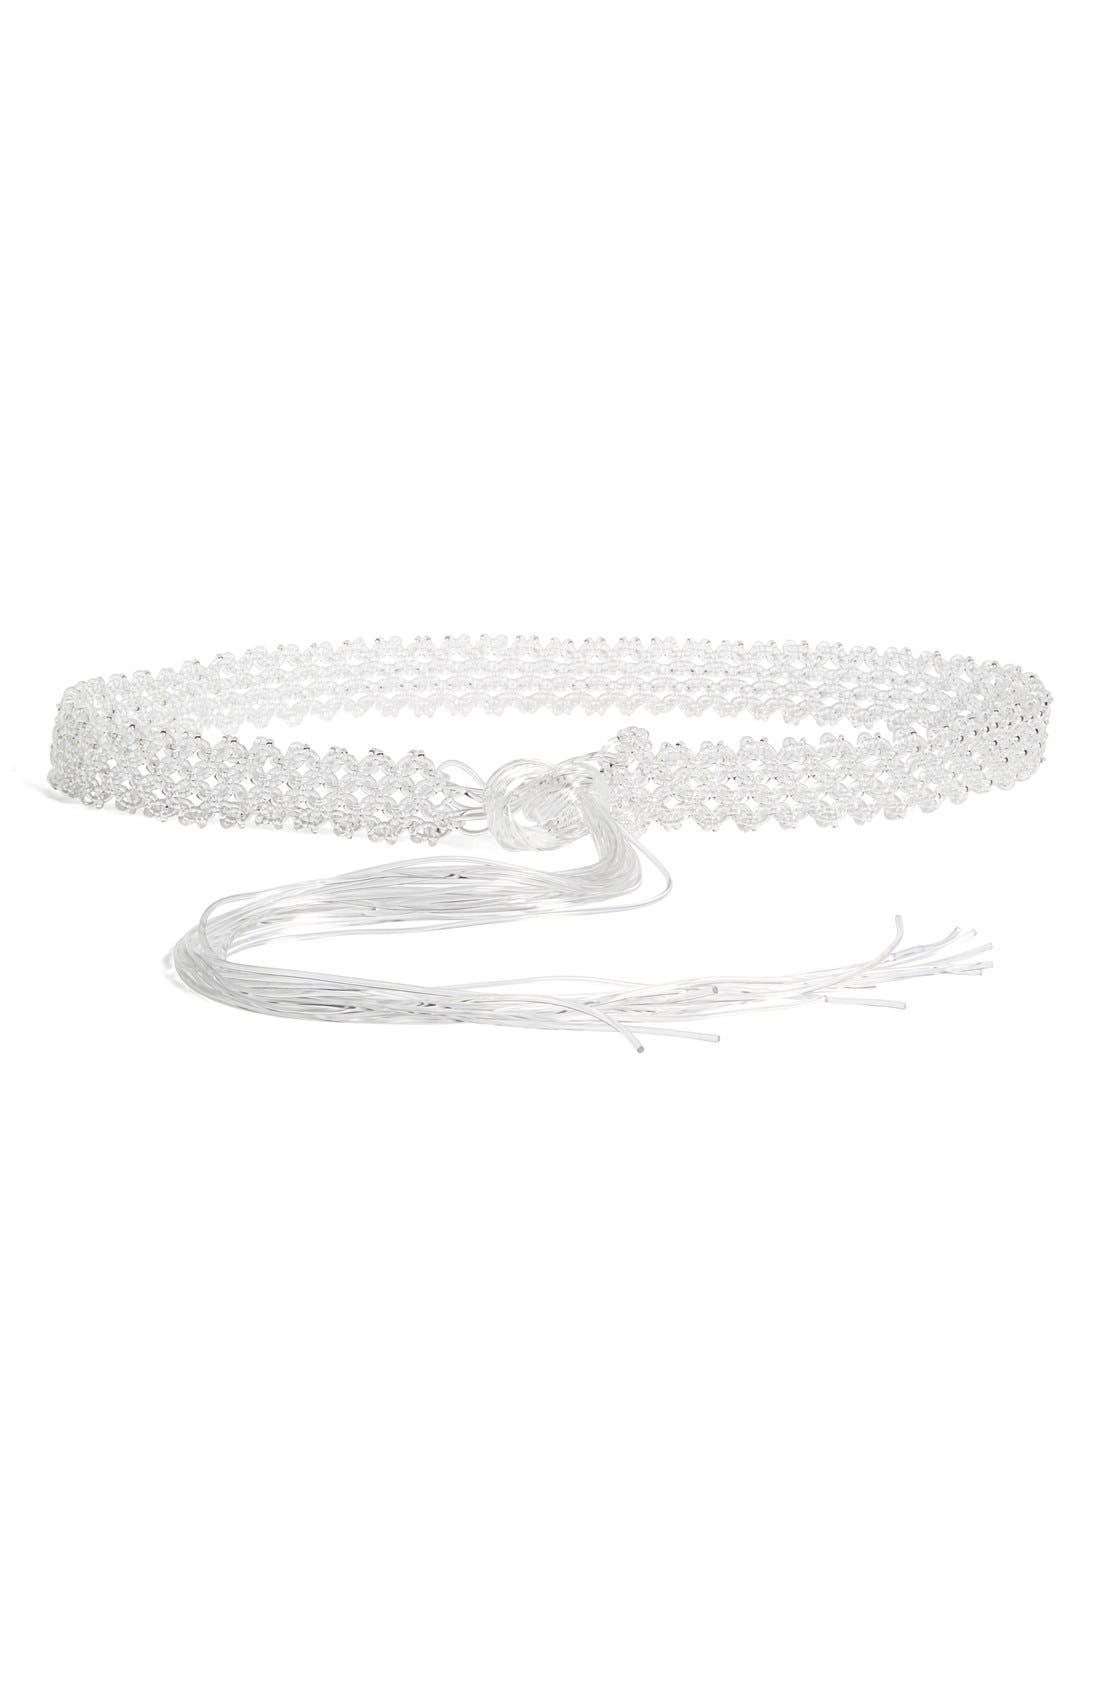 Main Image - Simone Rocha Jelly Cord Belt